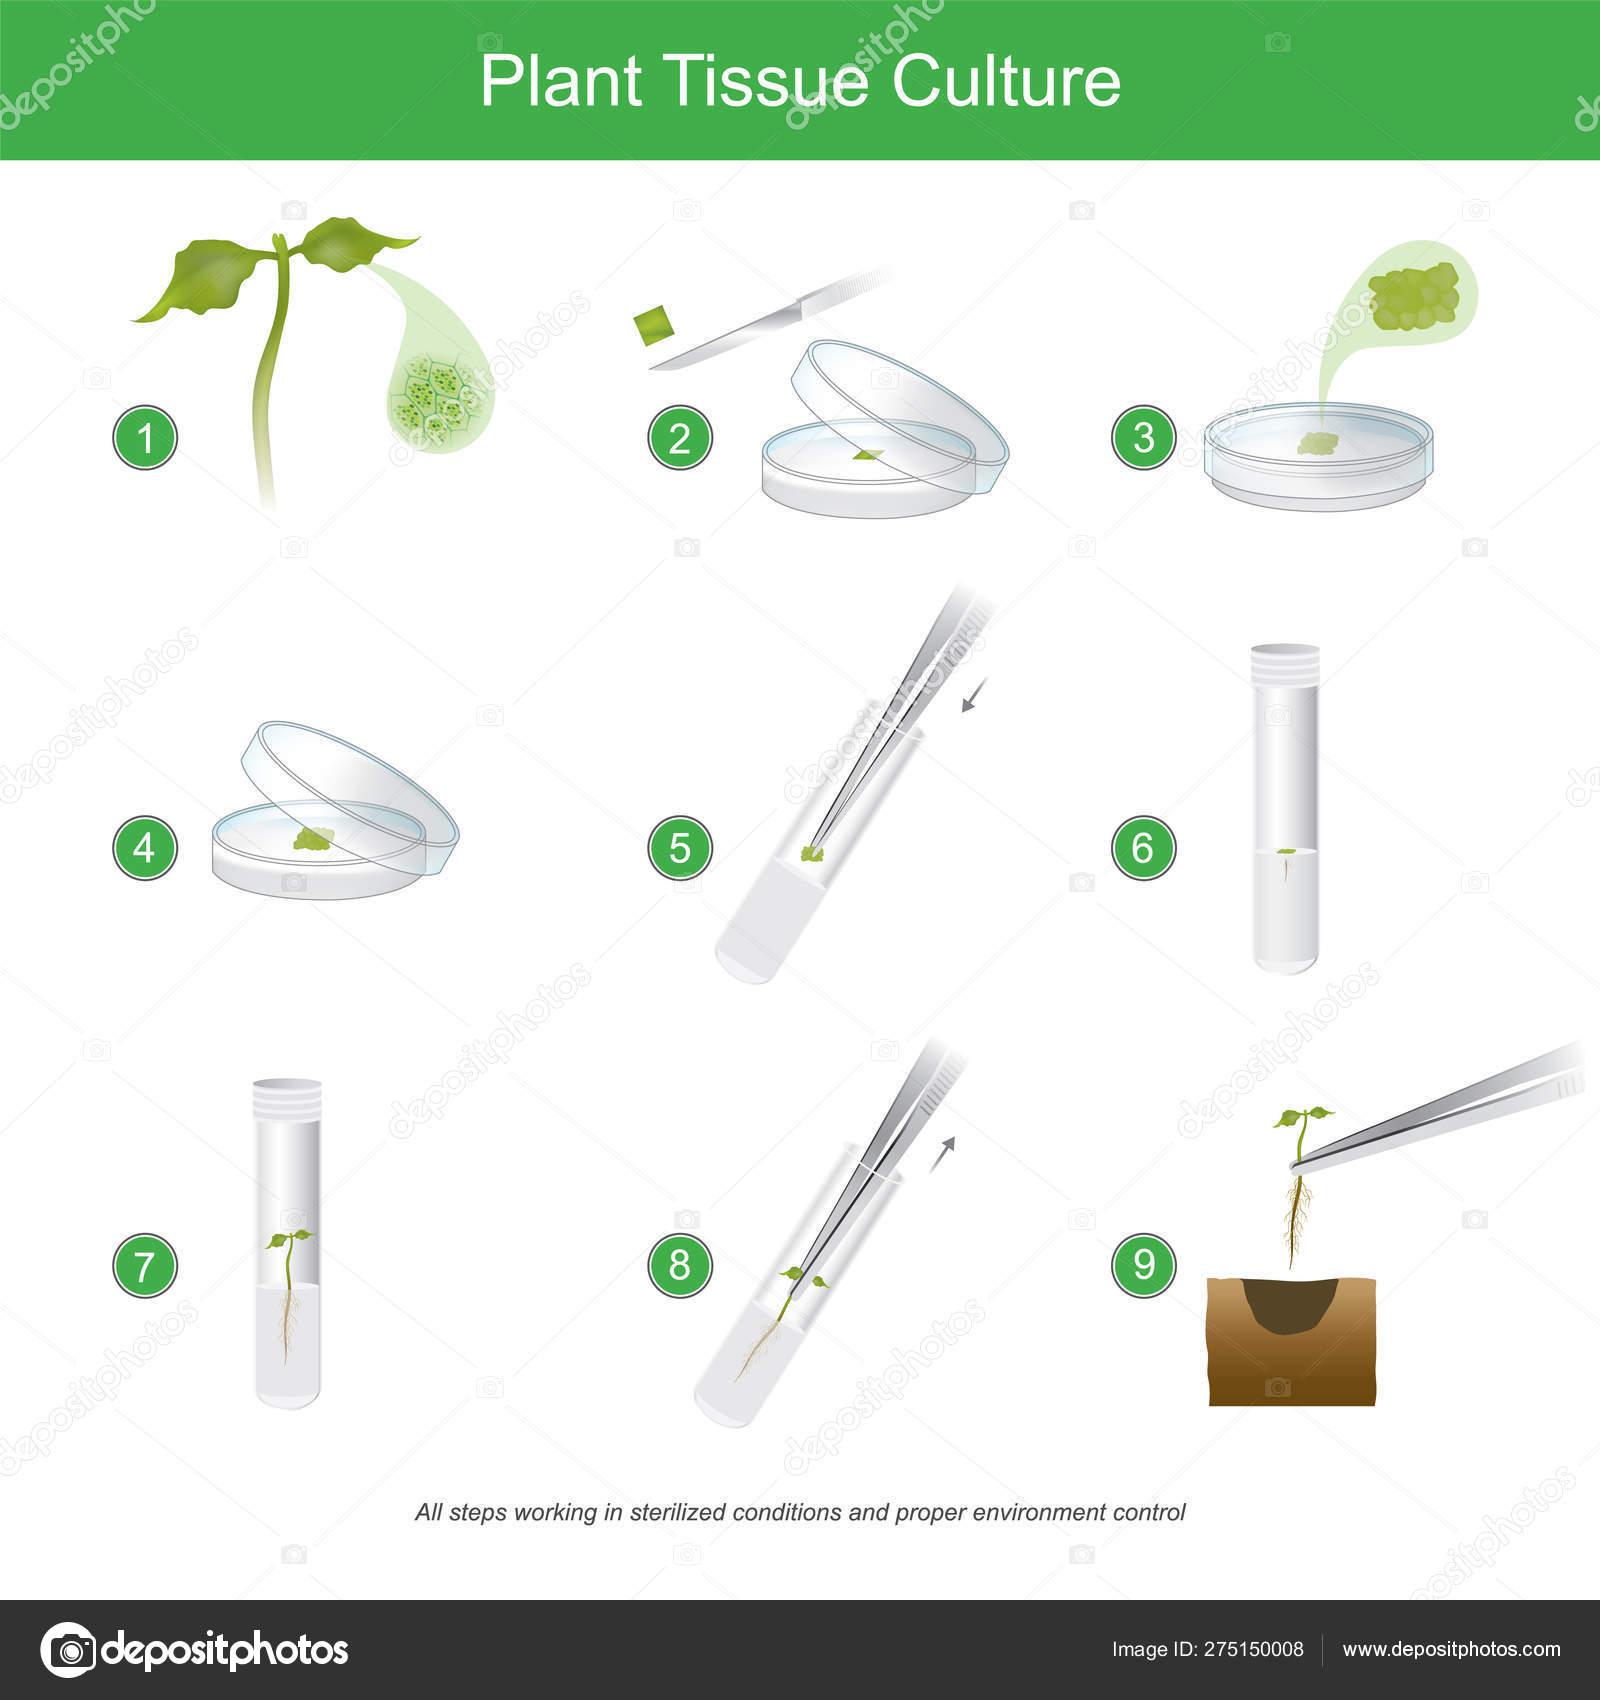 Plant Tissue Culture Rare Plant Tissue Culture With Cutting